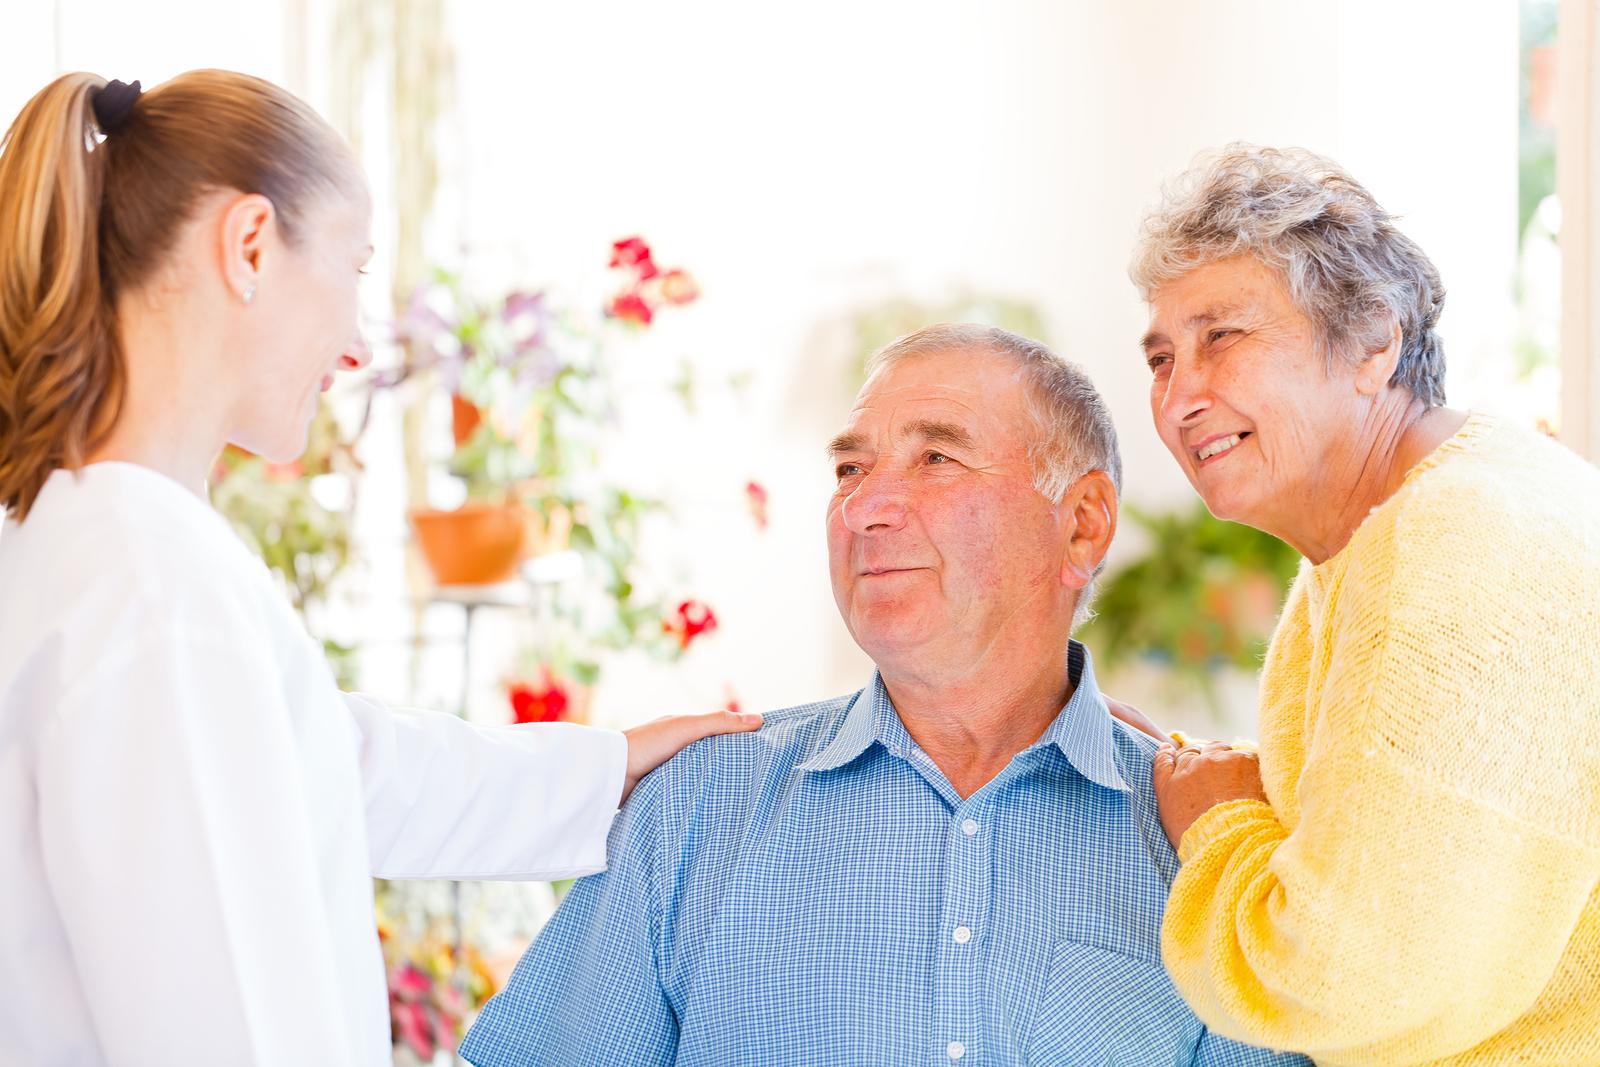 Elder Care Alpharetta GA - It's Time to Look into Elder Care Options